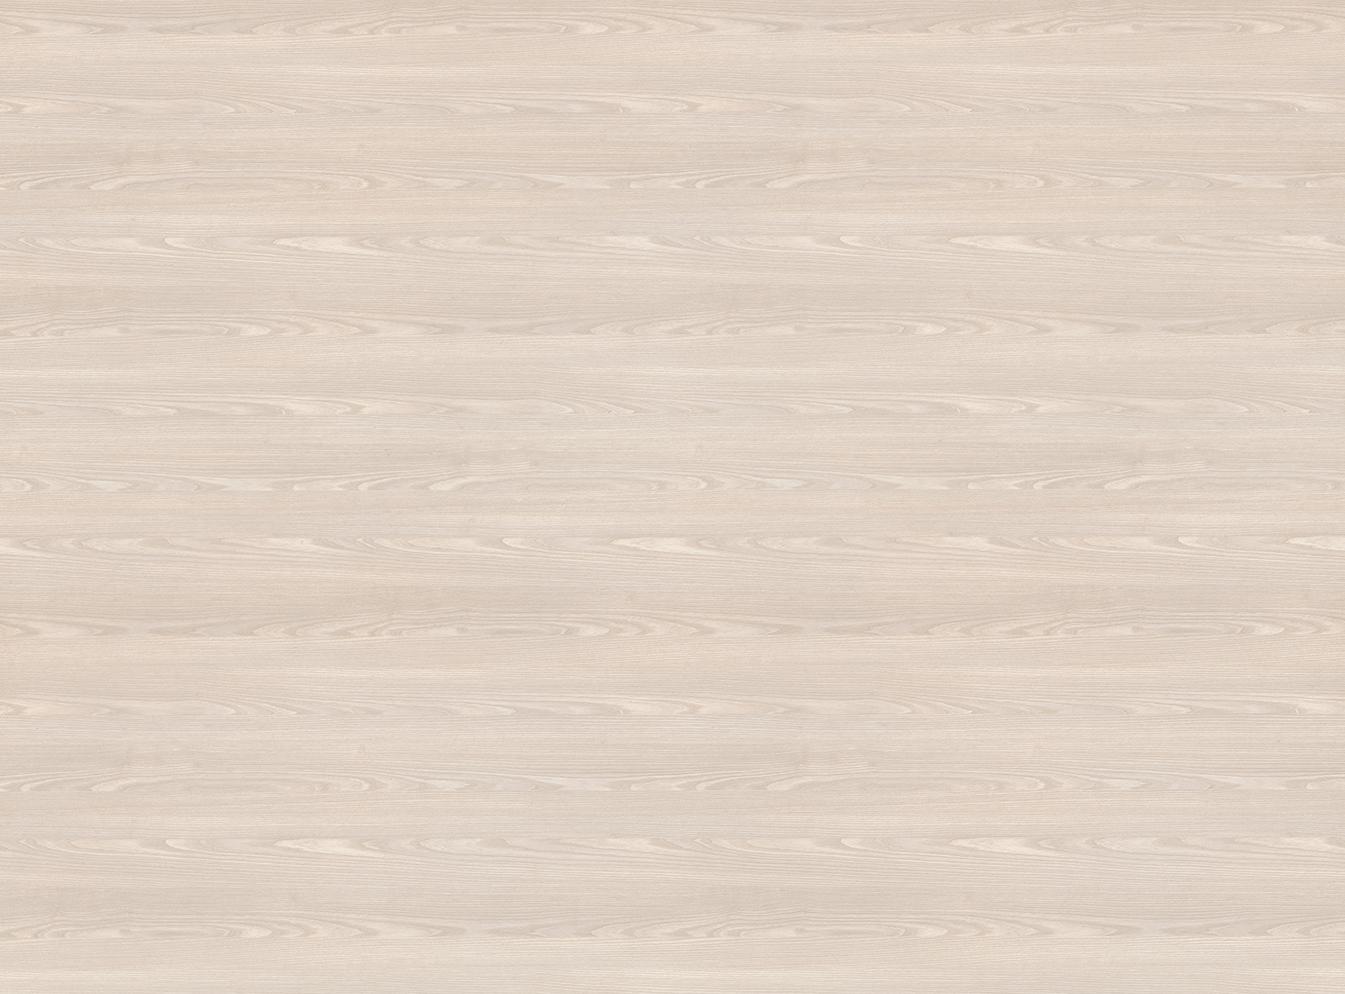 Лента AБC S143 26/1 Tivoli